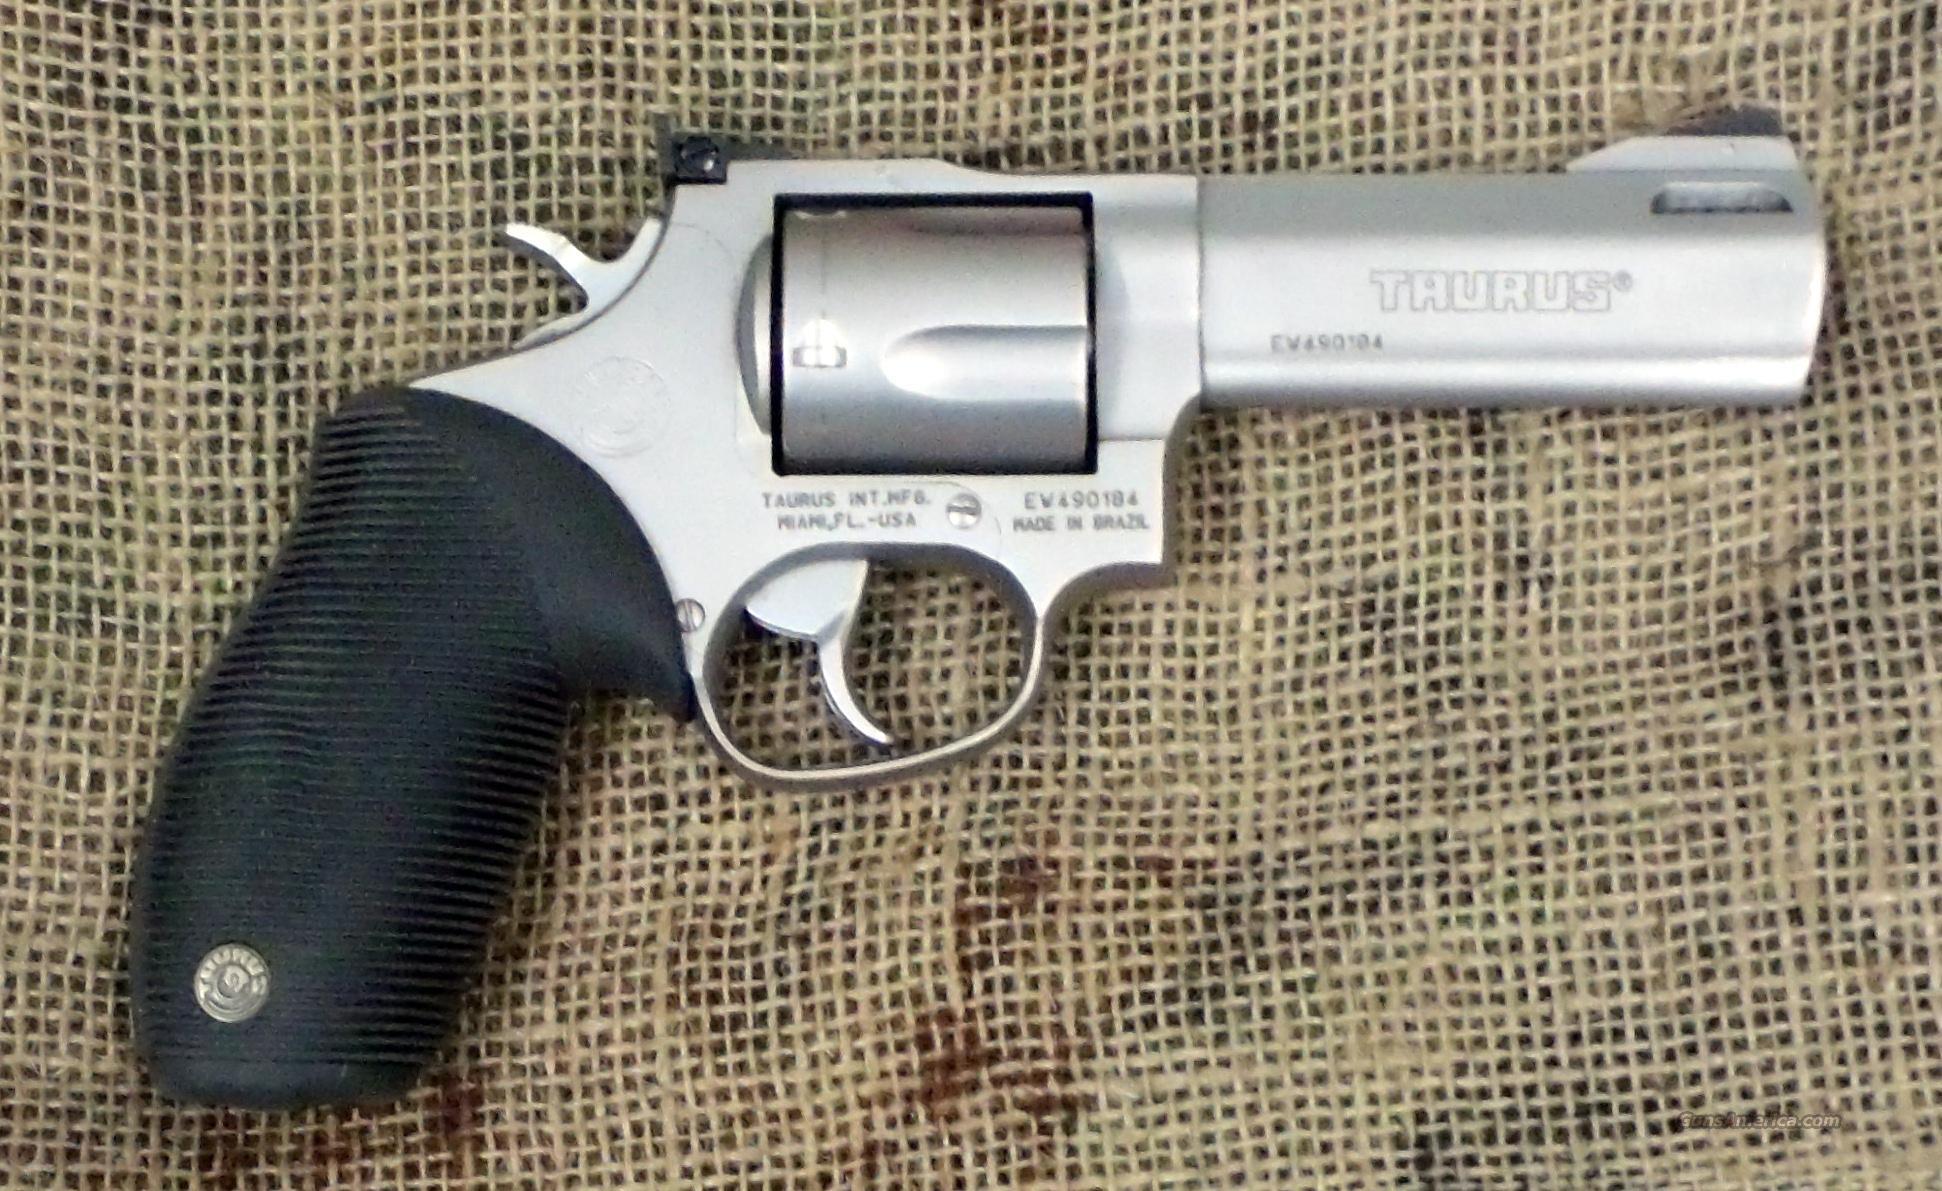 taurus model m44c tracker revolver 44 mag cal for sale. Black Bedroom Furniture Sets. Home Design Ideas